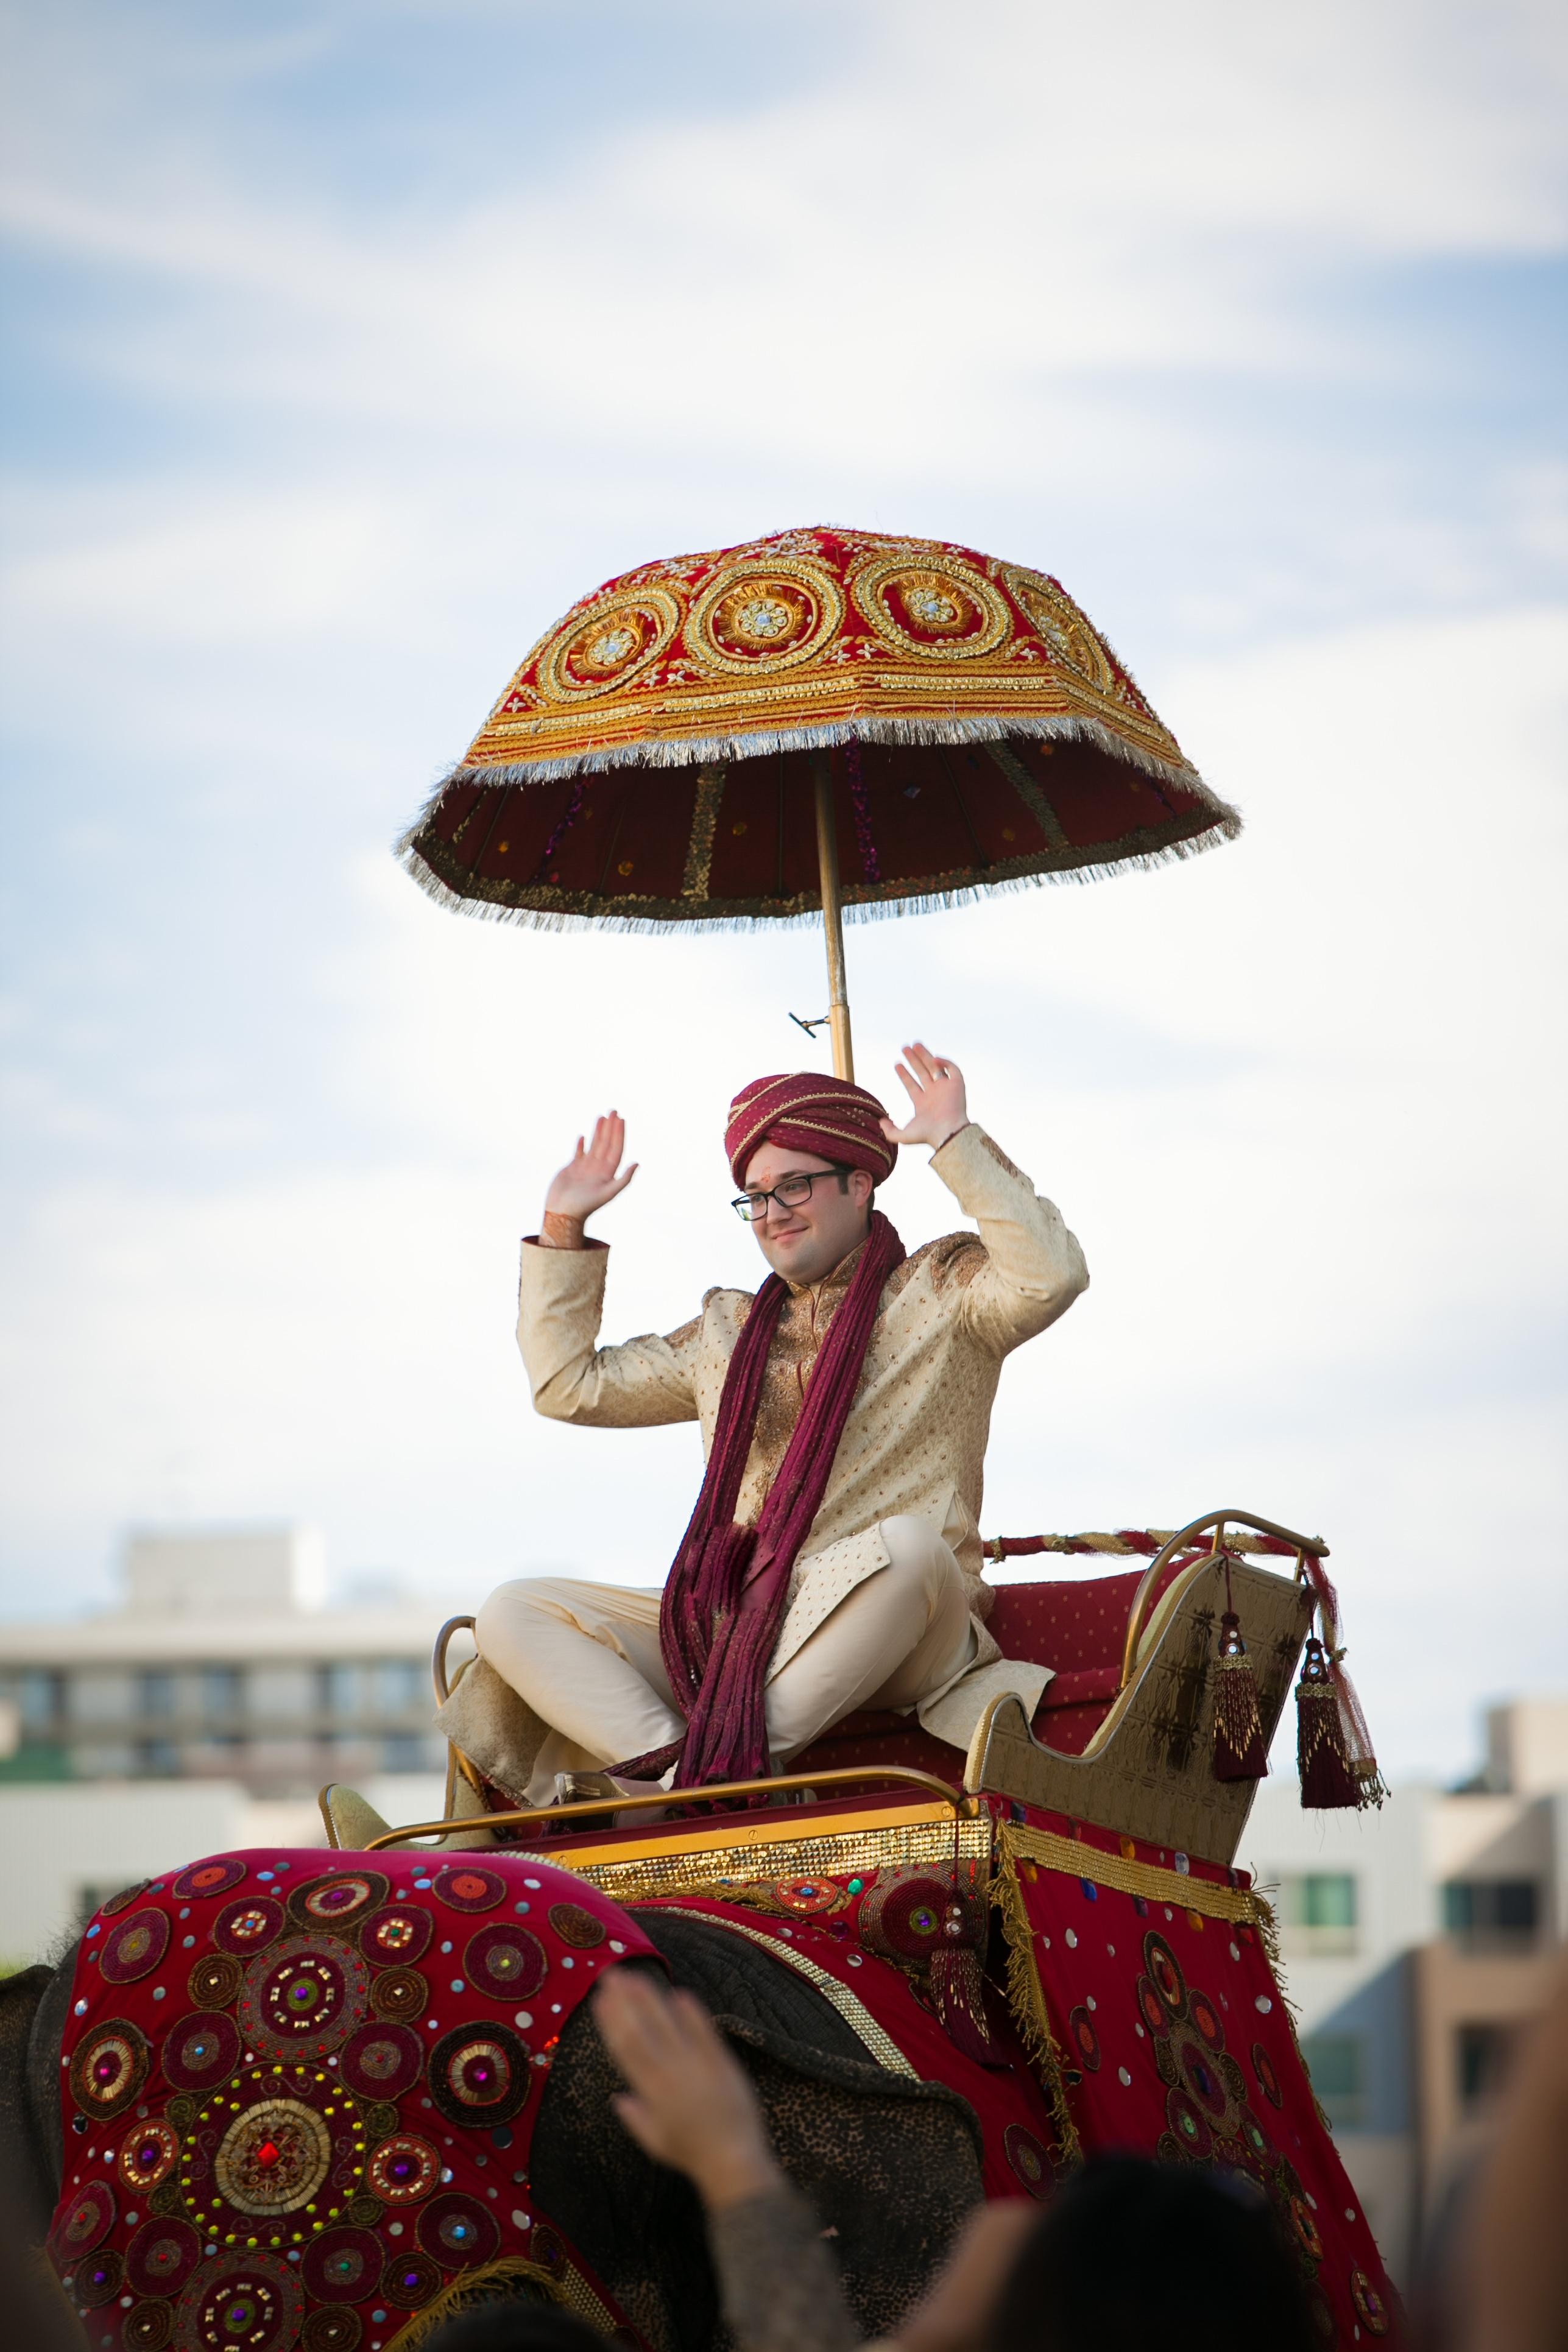 Vibiana Los Angeles Wedding, Indian Wedding, Los Angeles Wedding Planner, A Good Affair Wedding & Event Production, Tosti Studios